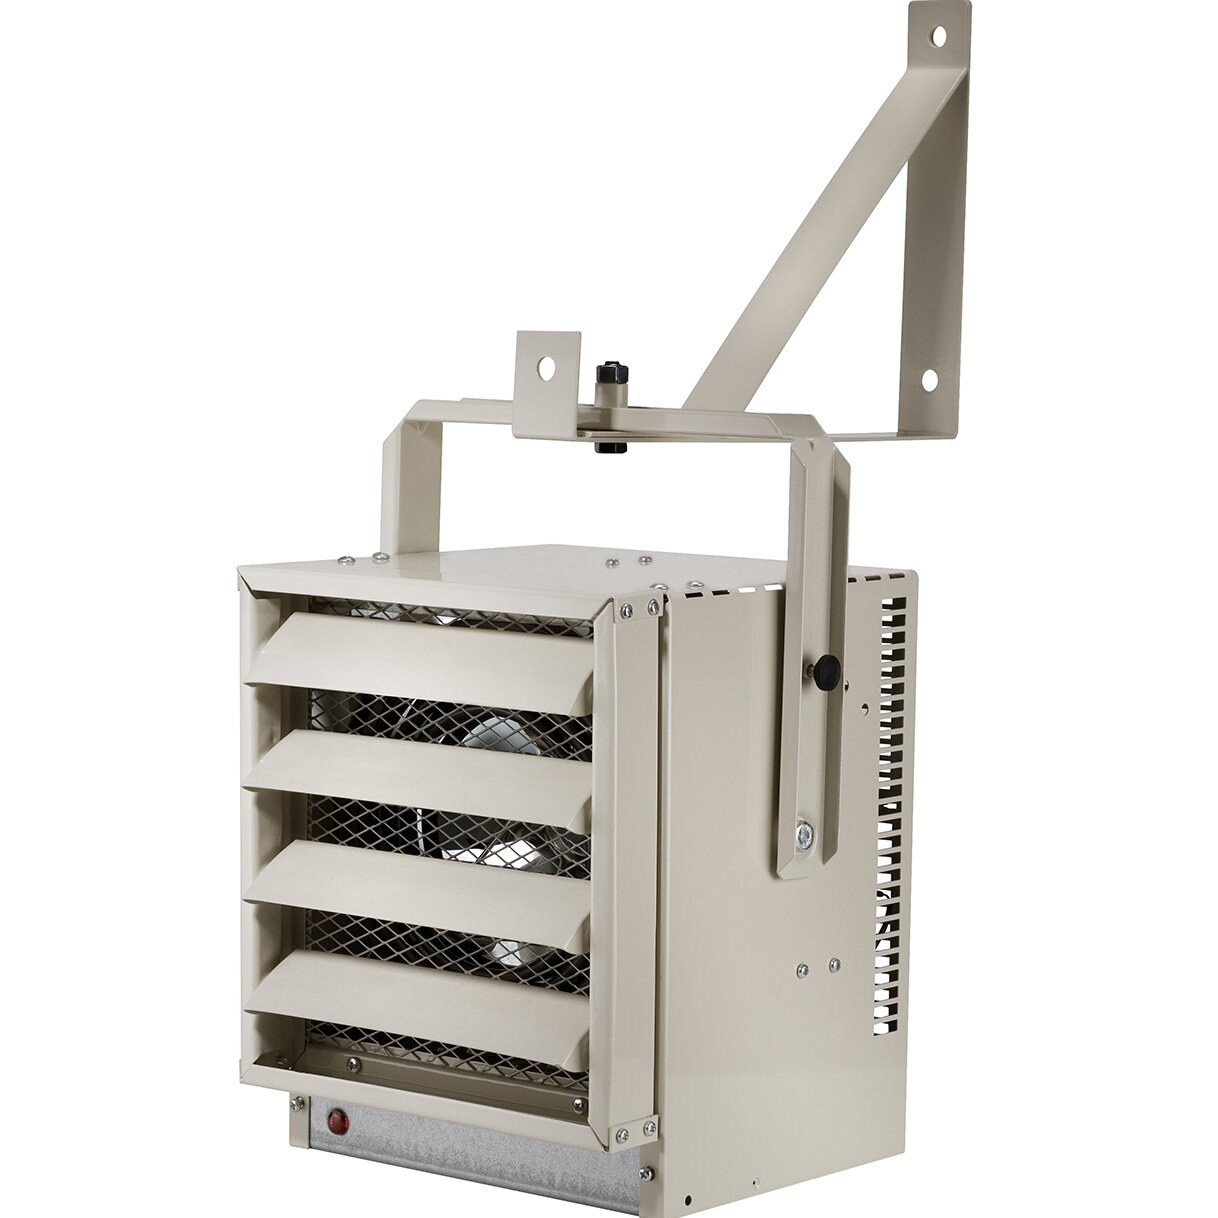 17 060 btu wall mounted electric fan compact heater wayfair. Black Bedroom Furniture Sets. Home Design Ideas